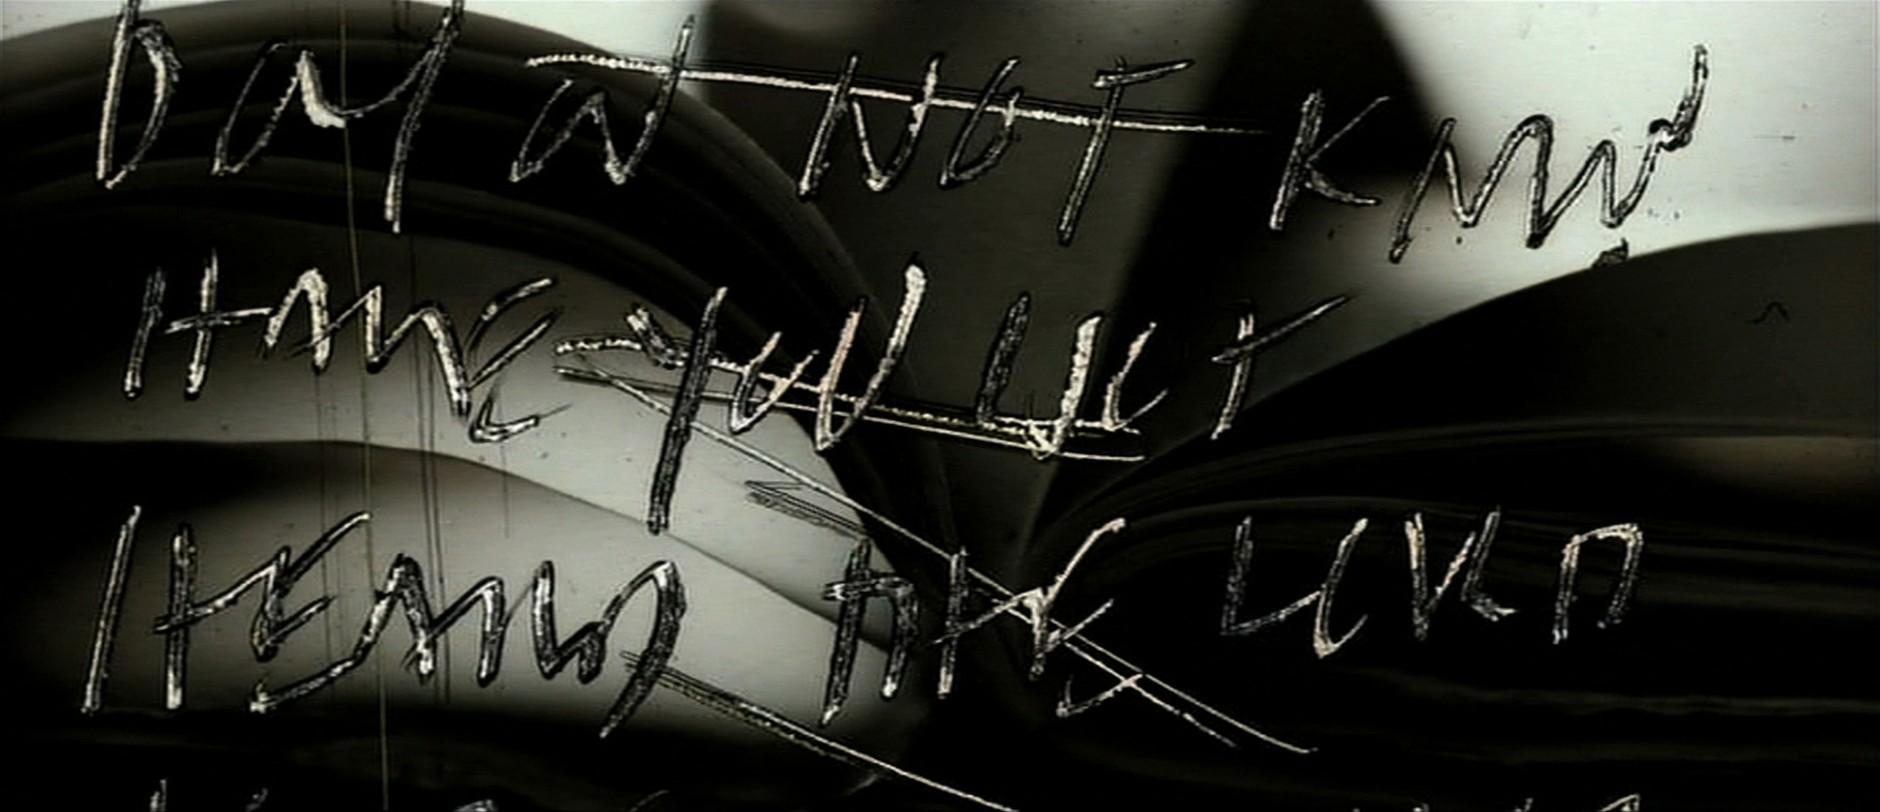 Bewegte Schrift | Kyle Cooper / Imaginary Forces, Se7en, Filmbild aus der Titelsequenz, 1995, © Imaginary Forces